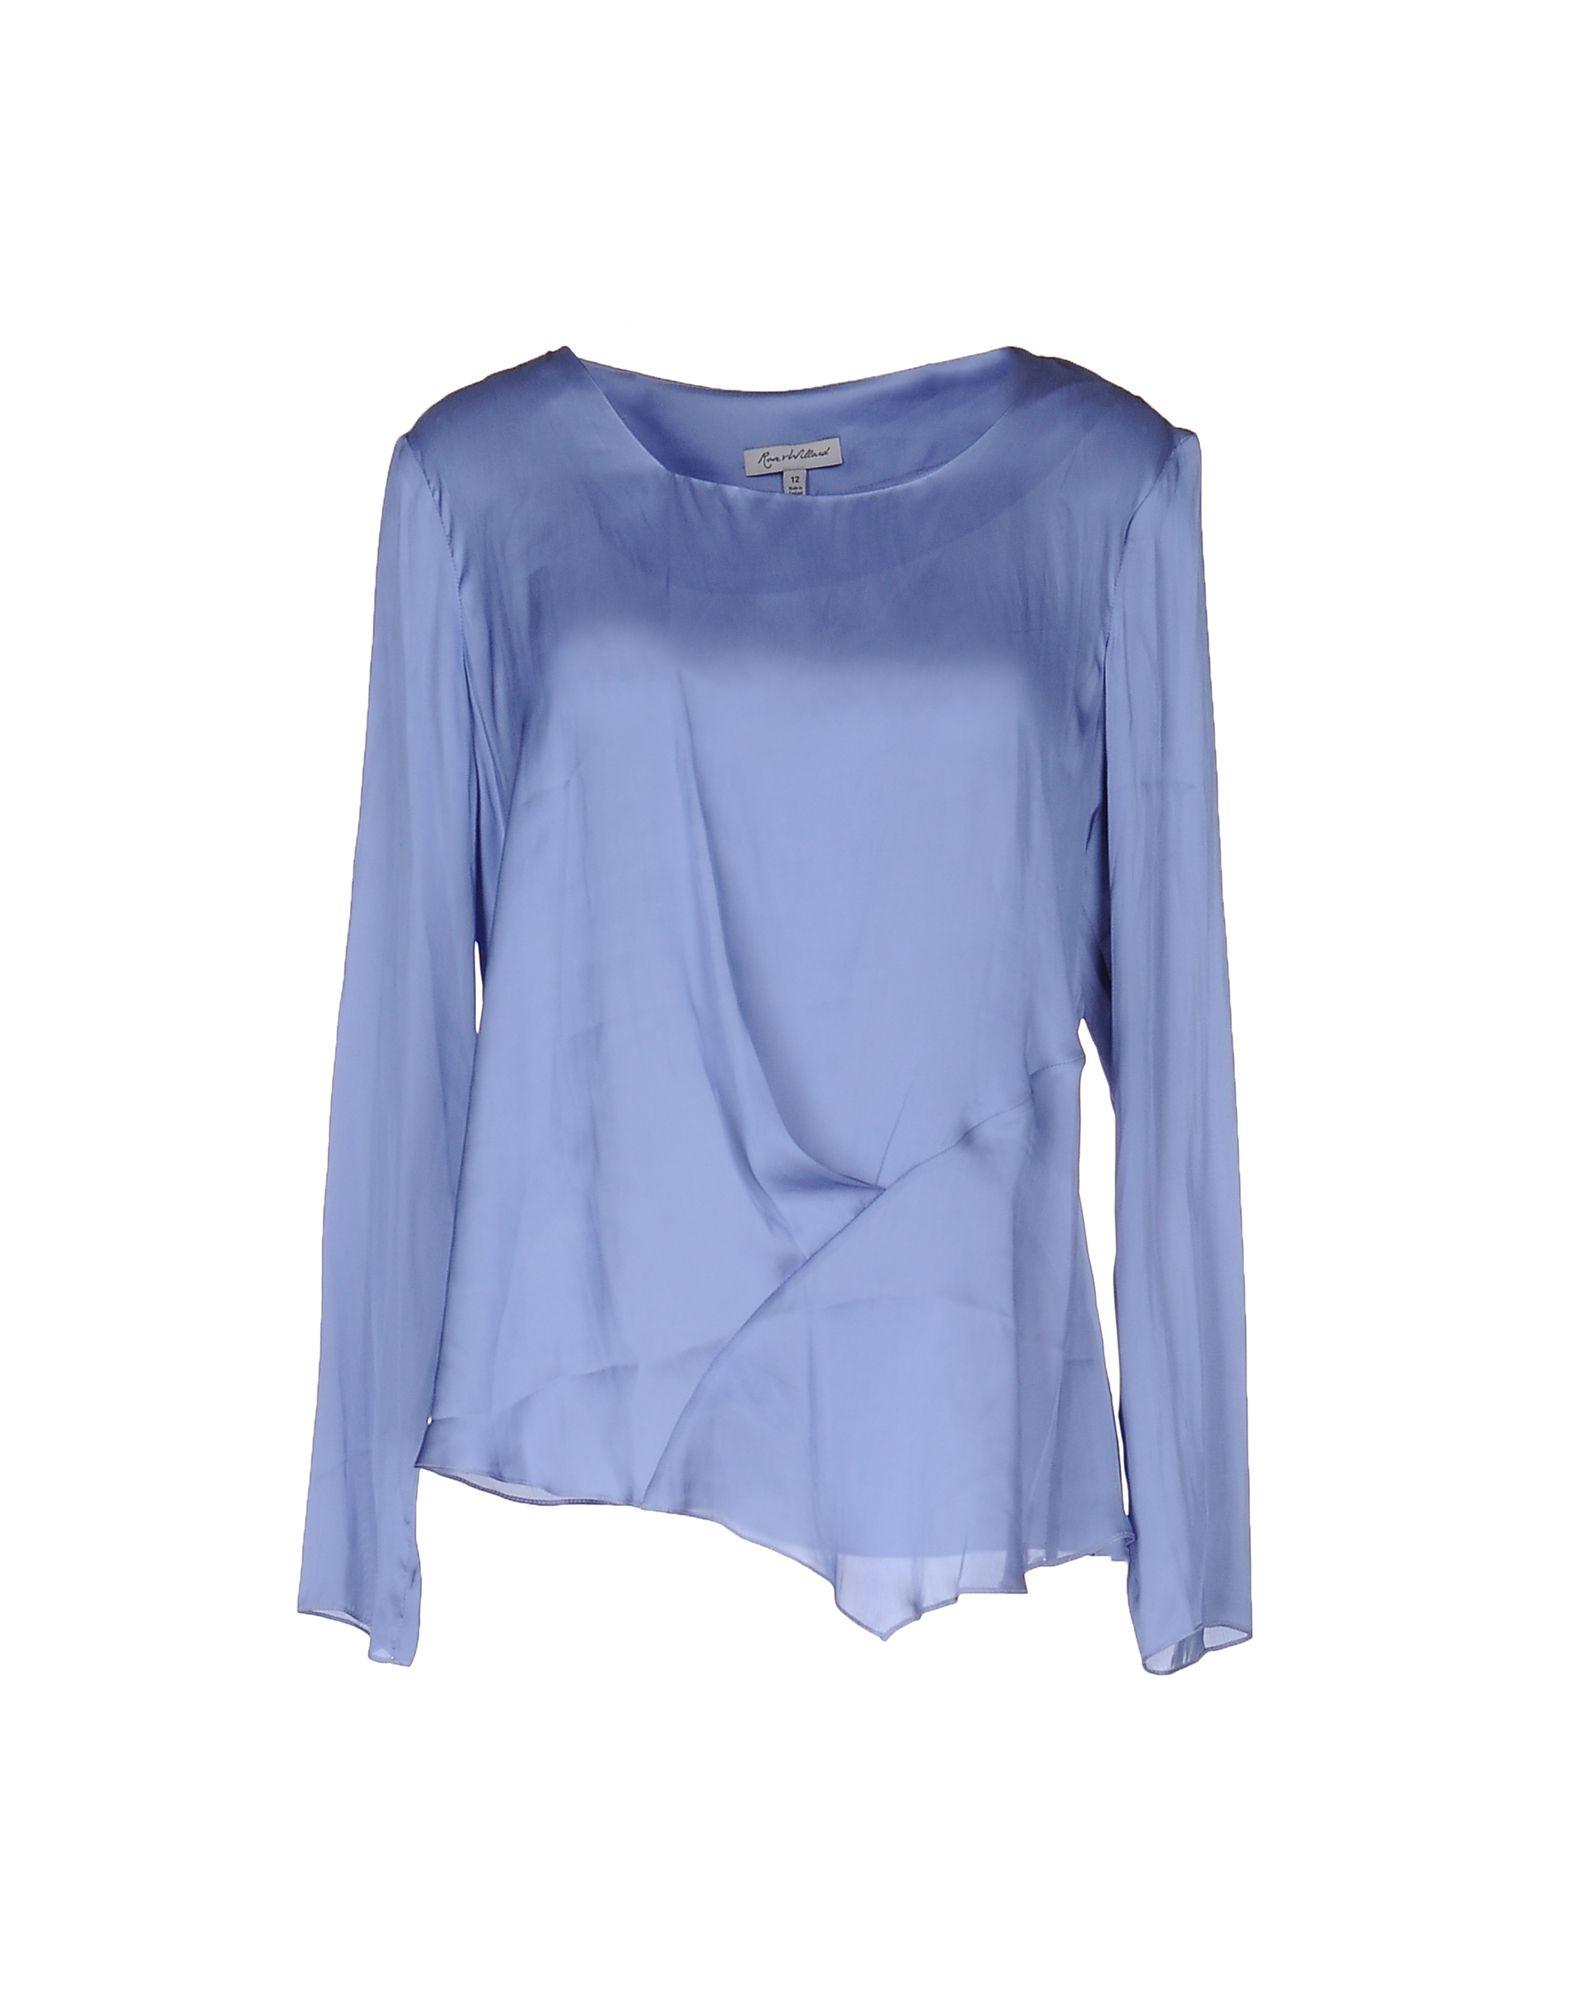 ФОТО rose & willard блузка